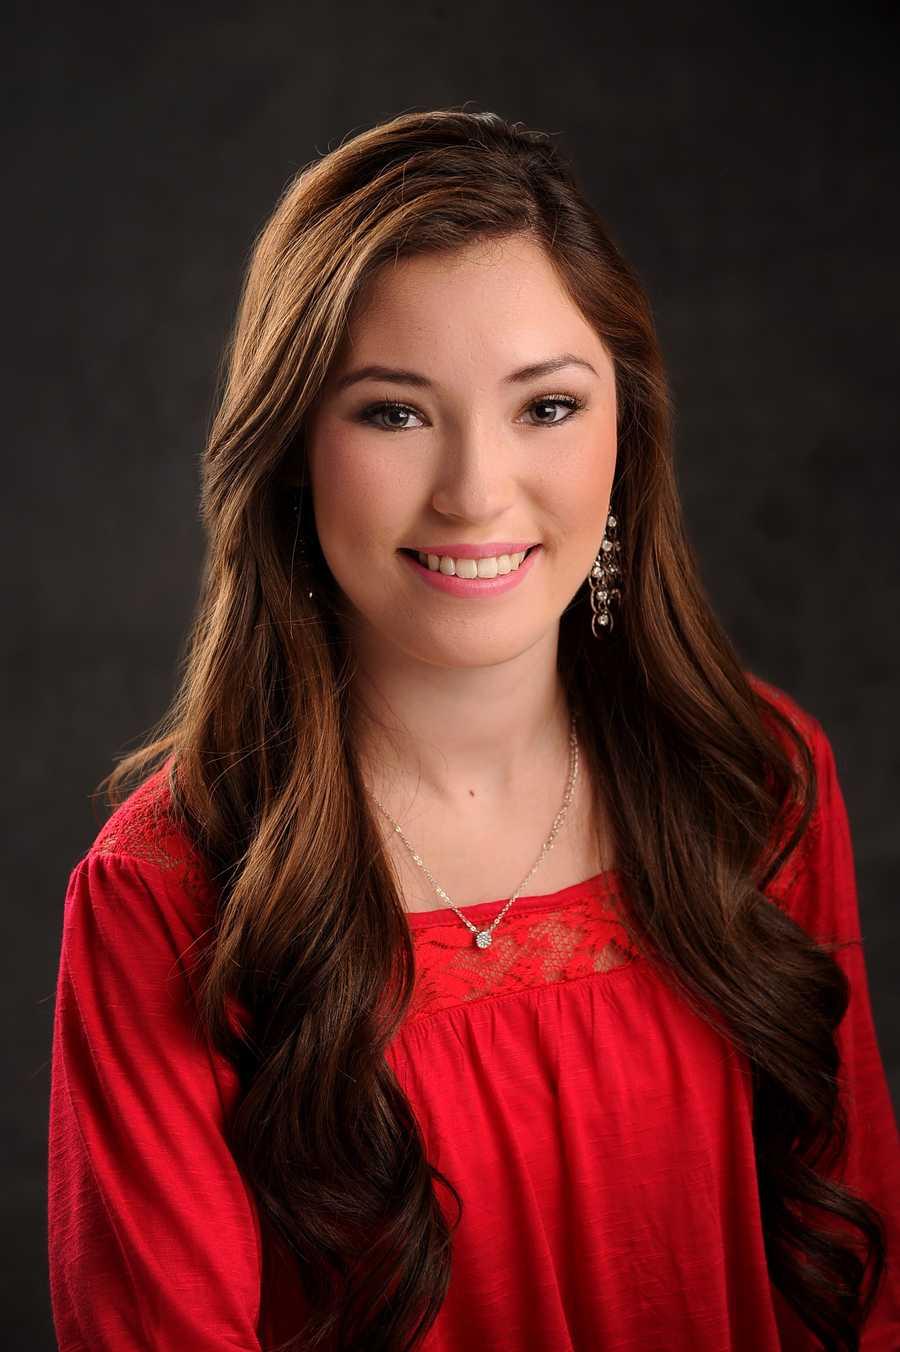 Misa Tran, Miss Otero County